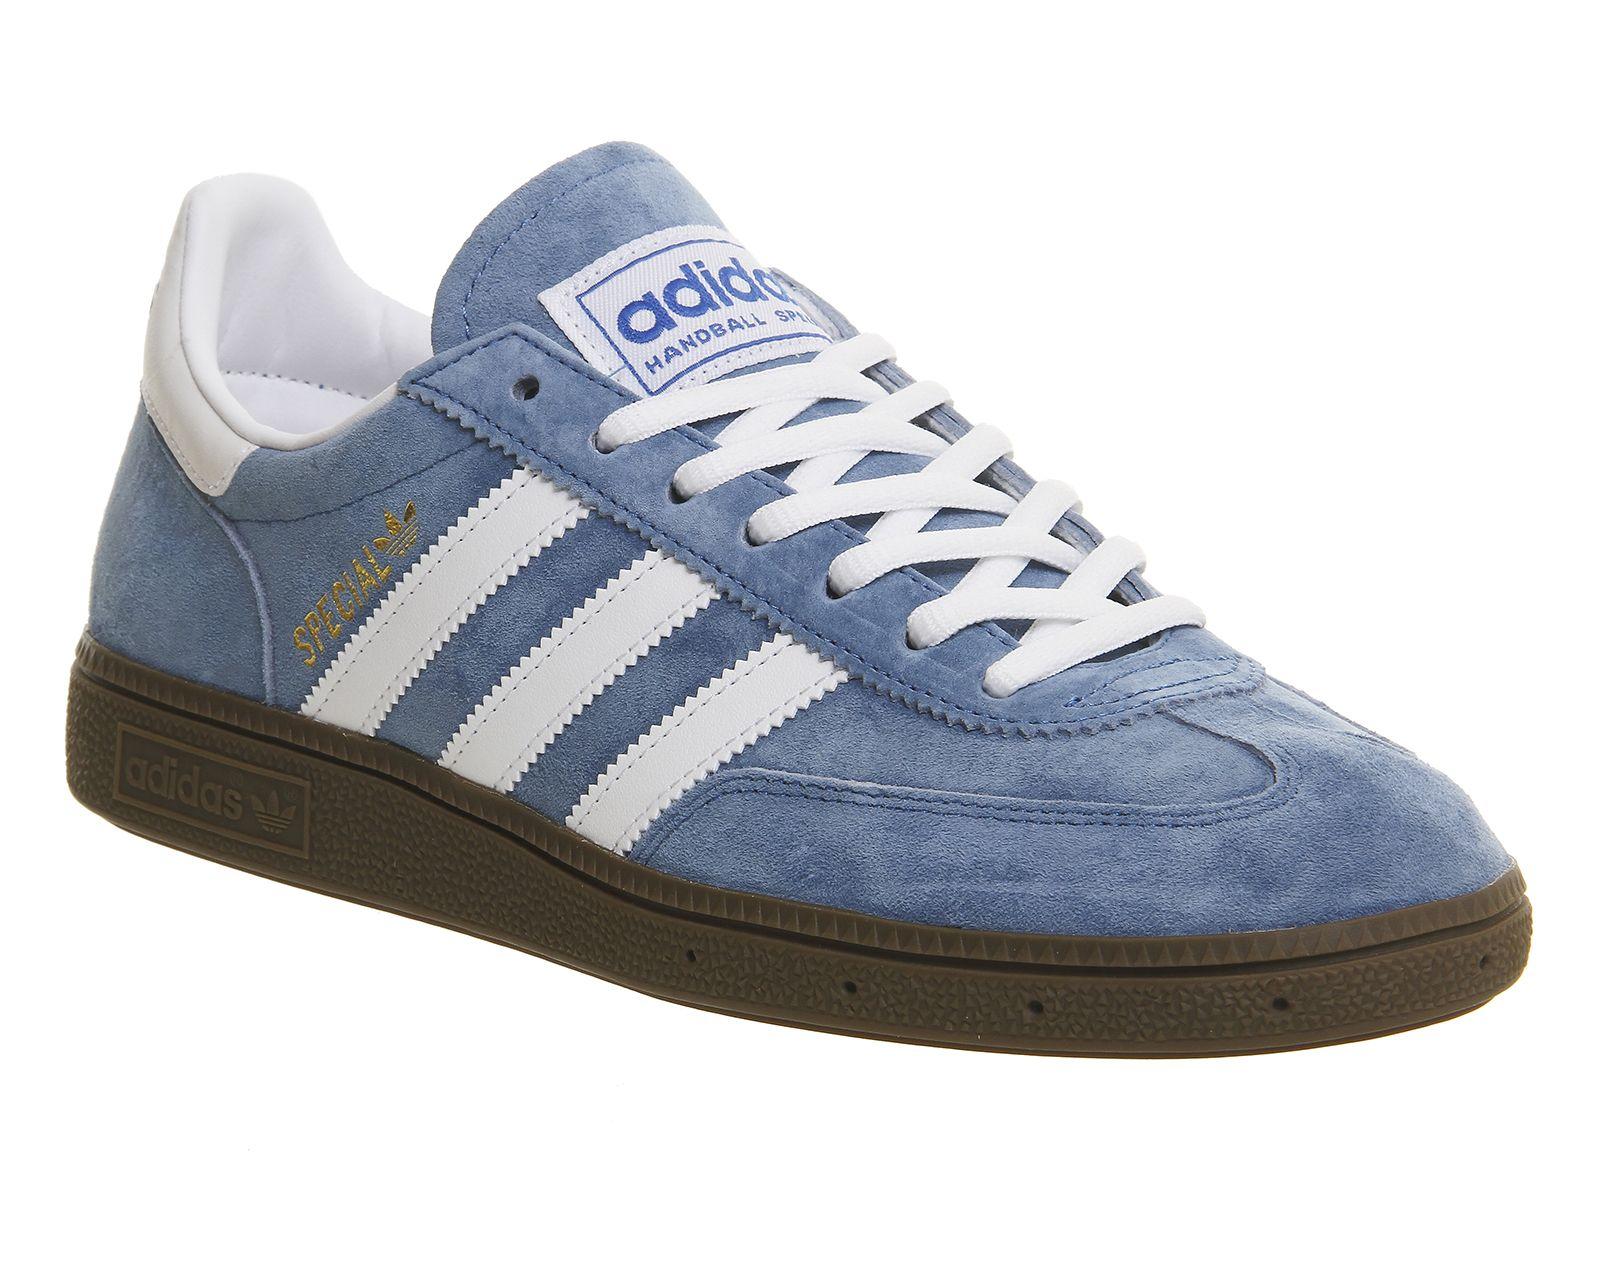 Adidas, Handball Spezial, Blue Running White | Adidas